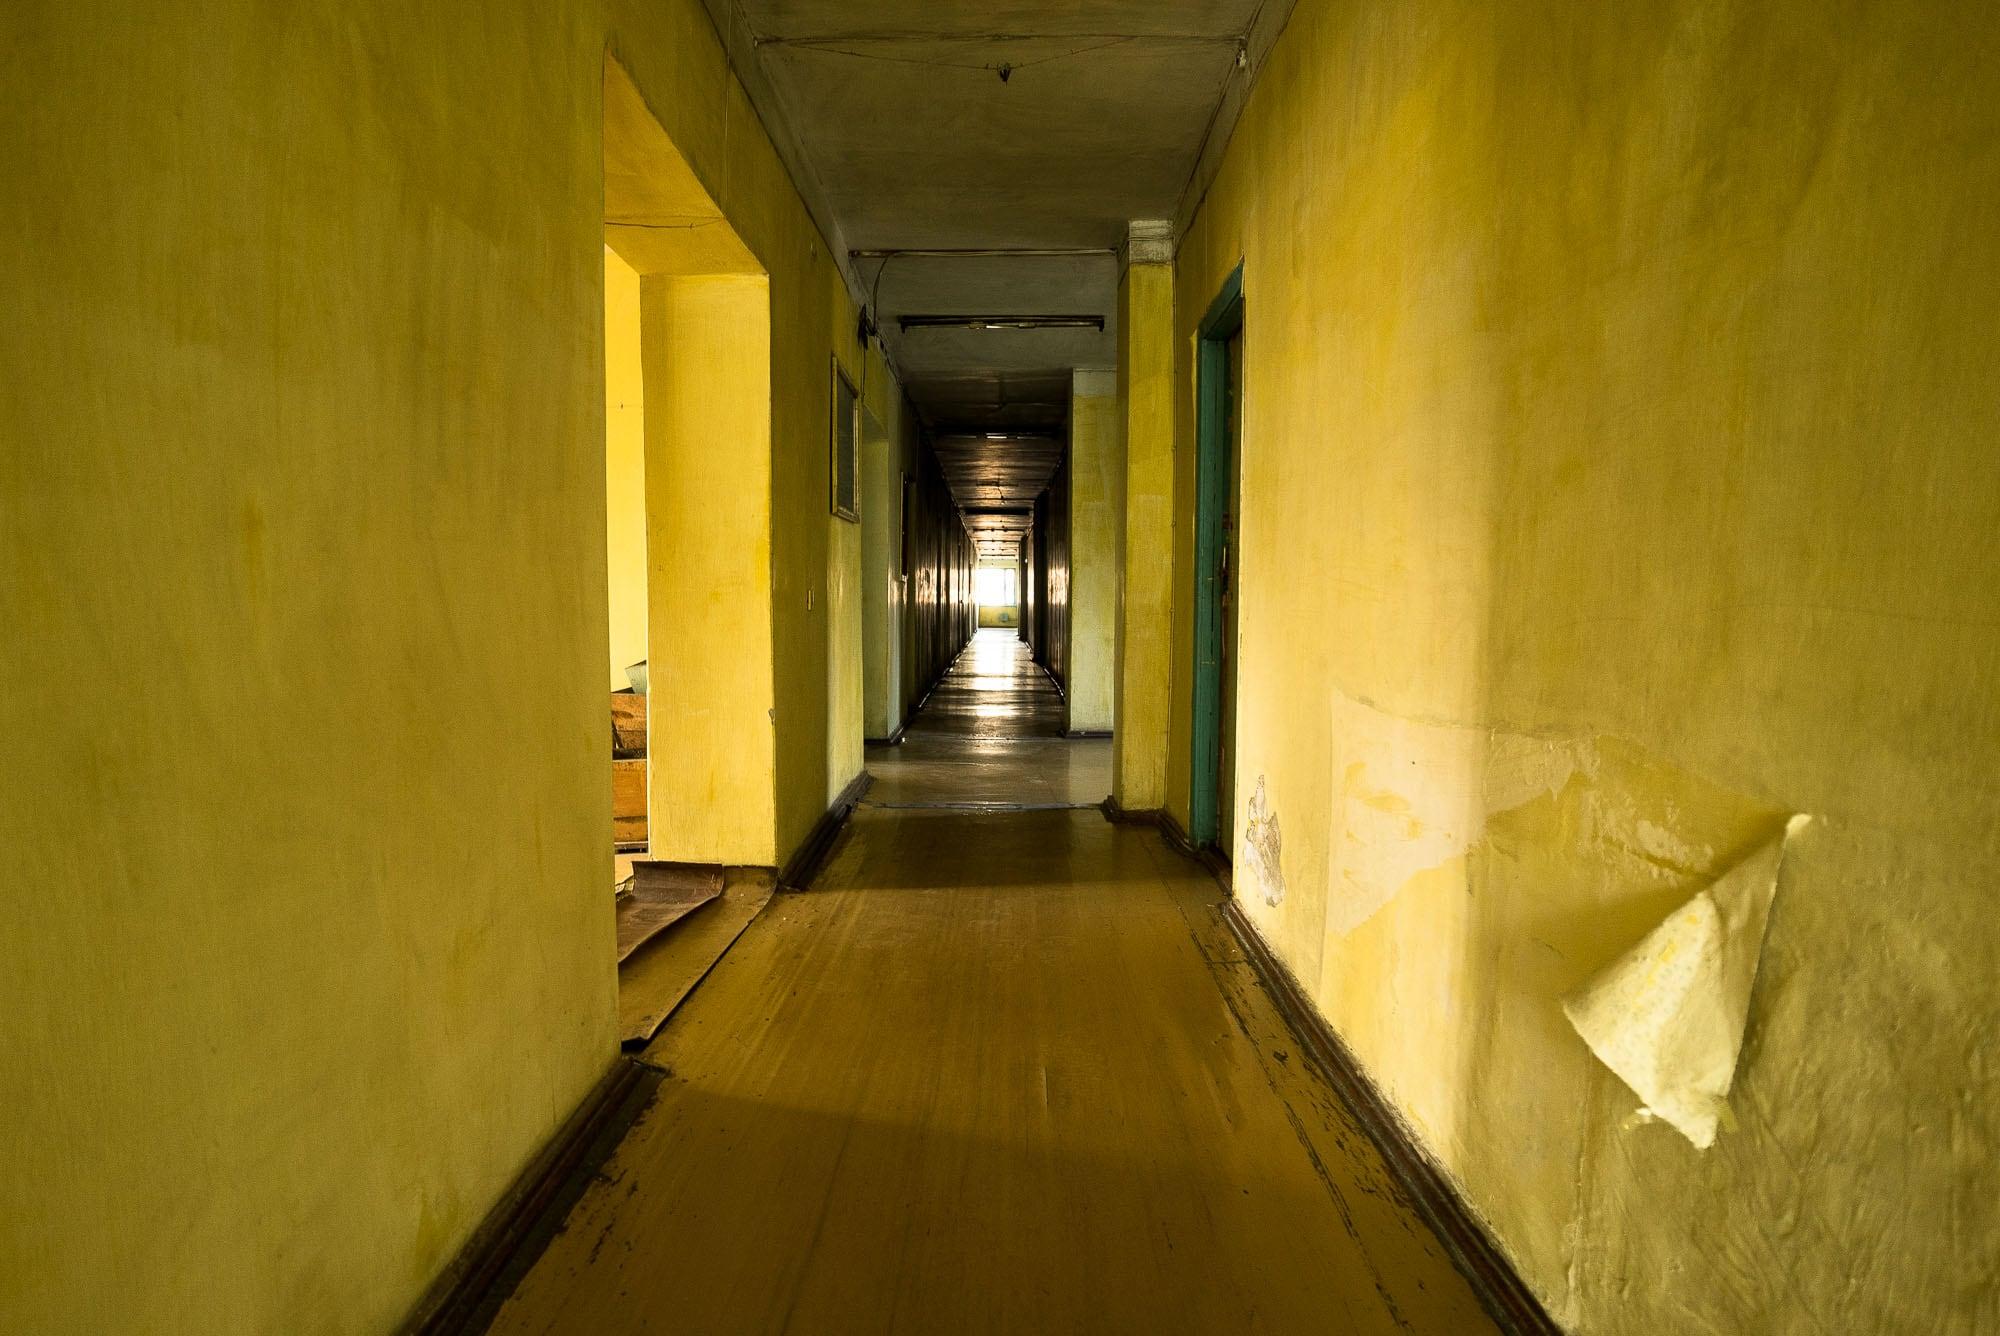 hotel corridor in Kara-Balta